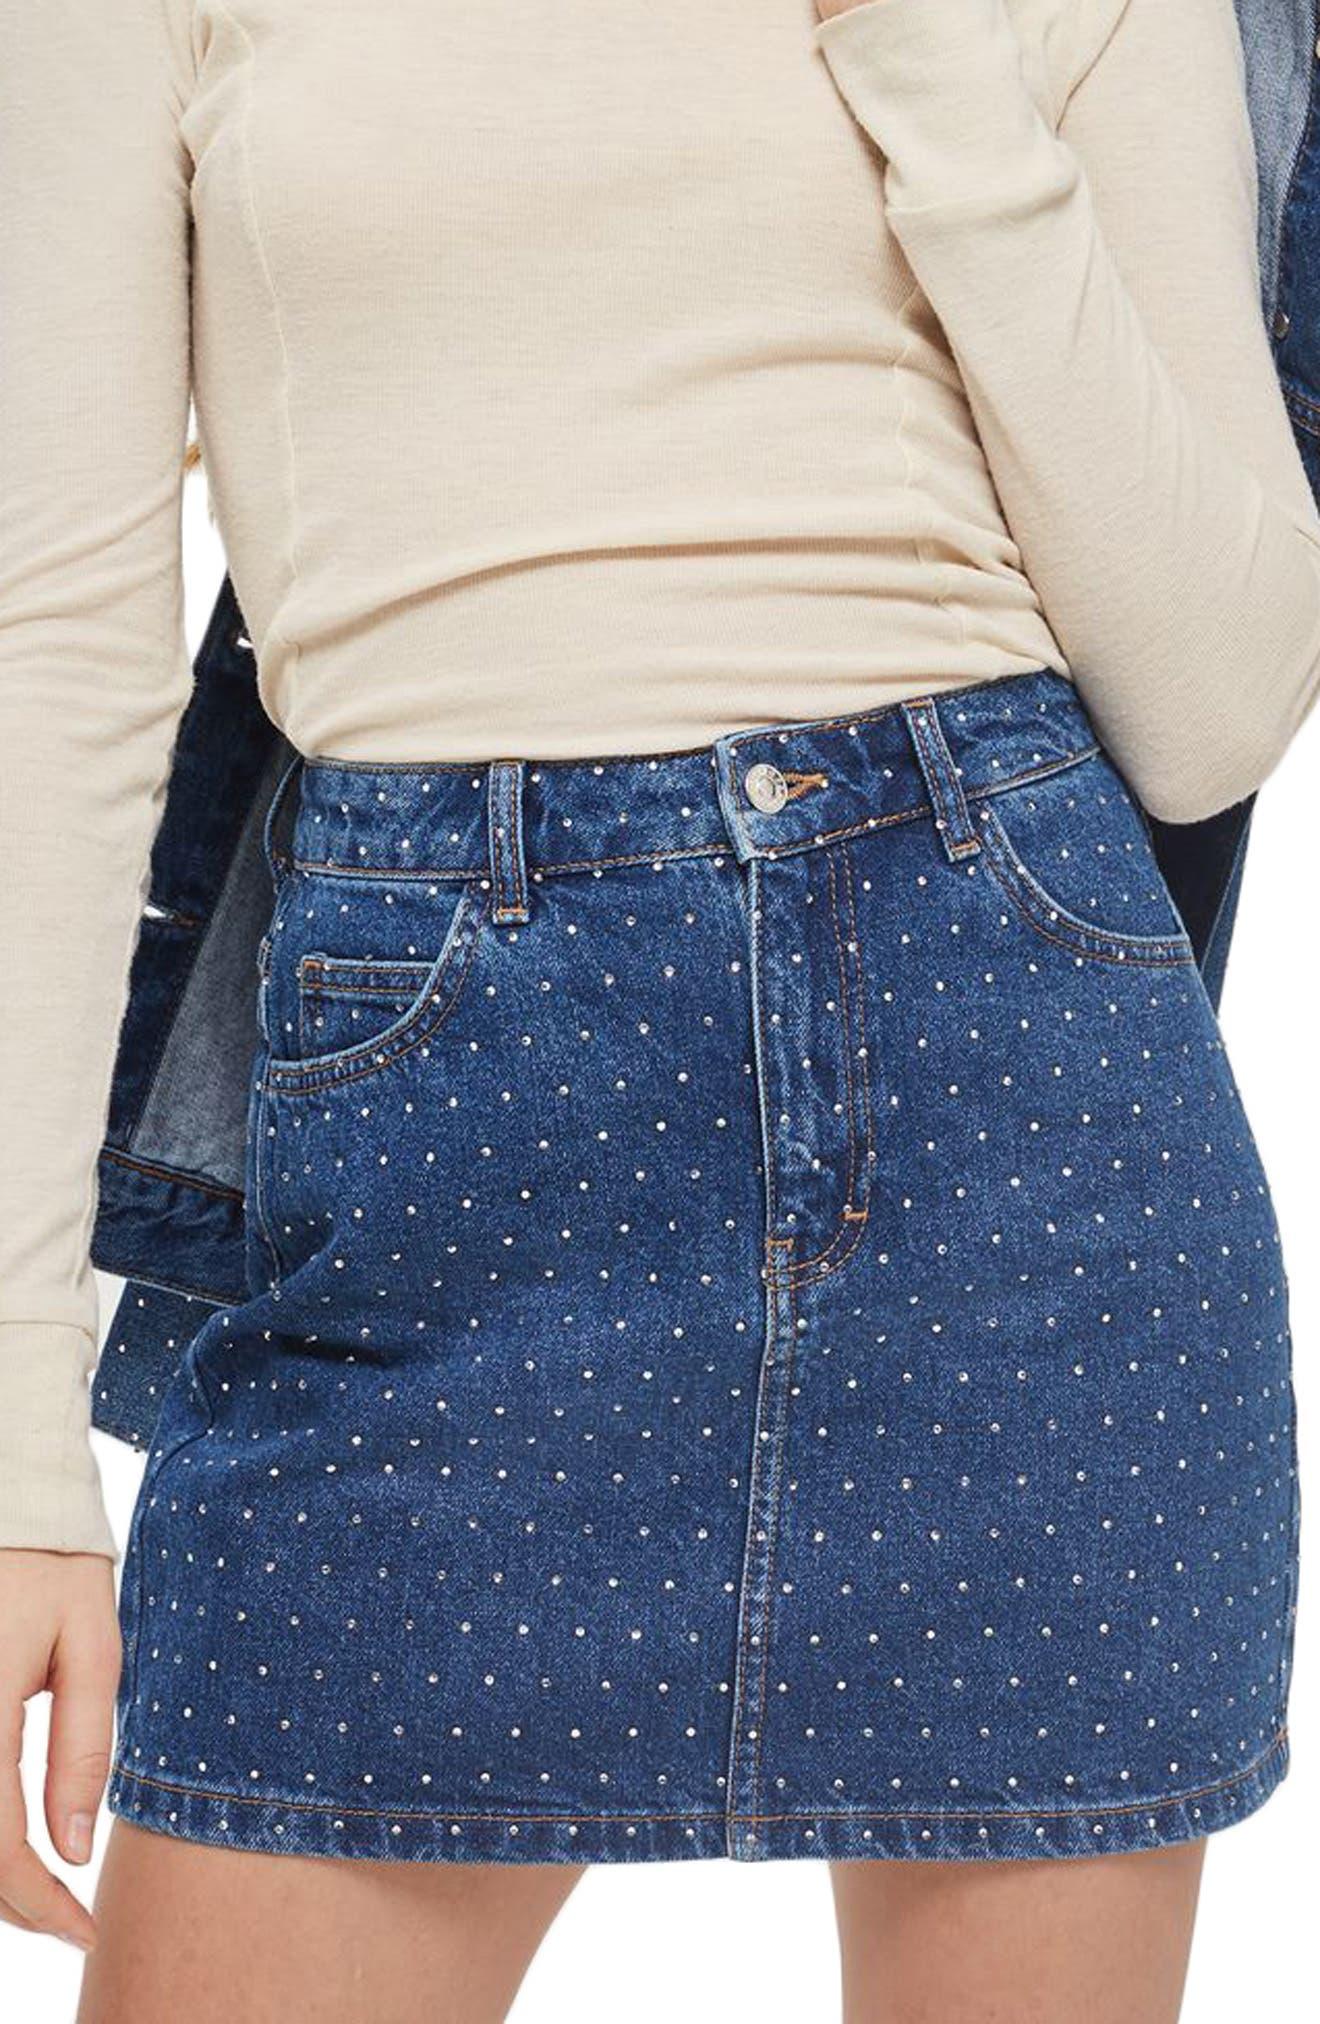 Main Image - Topshop Crystal Studded Denim Miniskirt